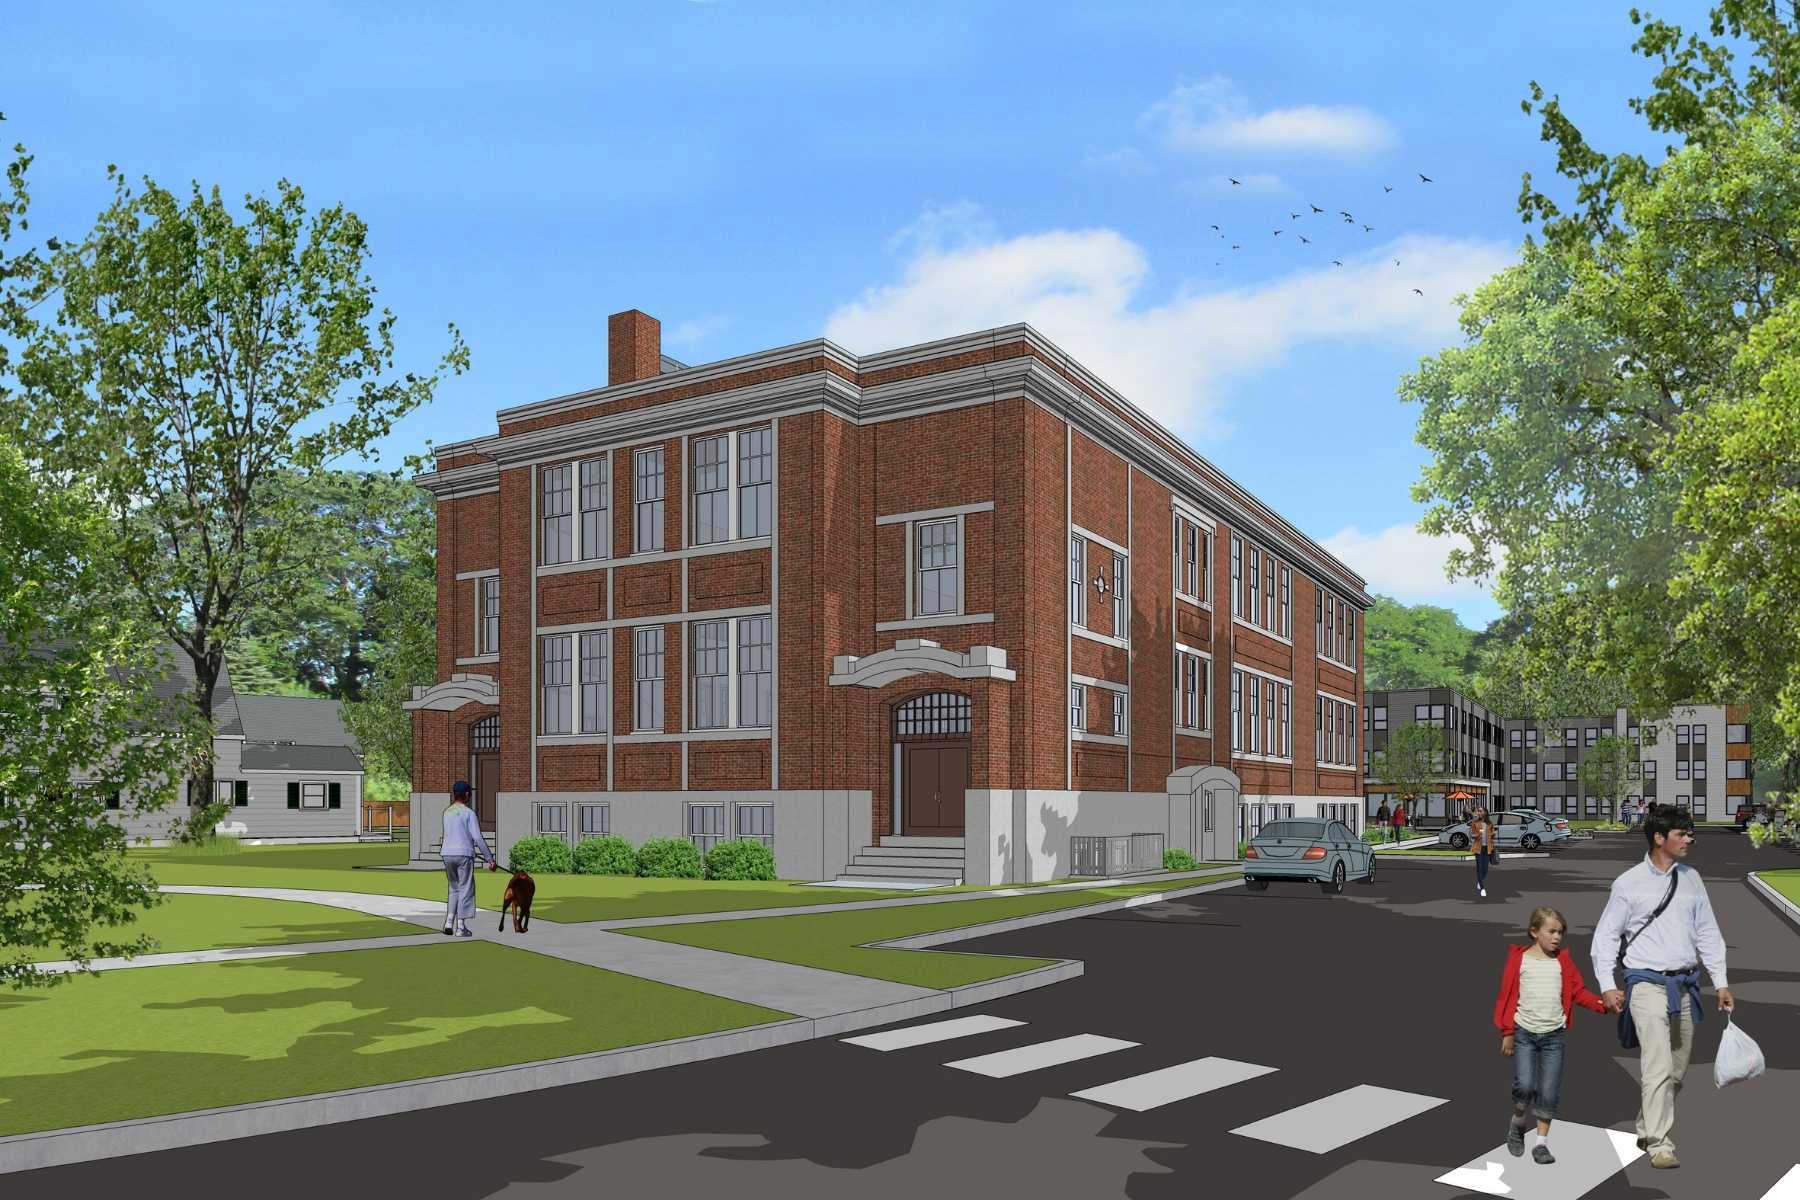 1-CapstoneCommunities-property-McElwainSchoolApartments-Bridgewater.jpg